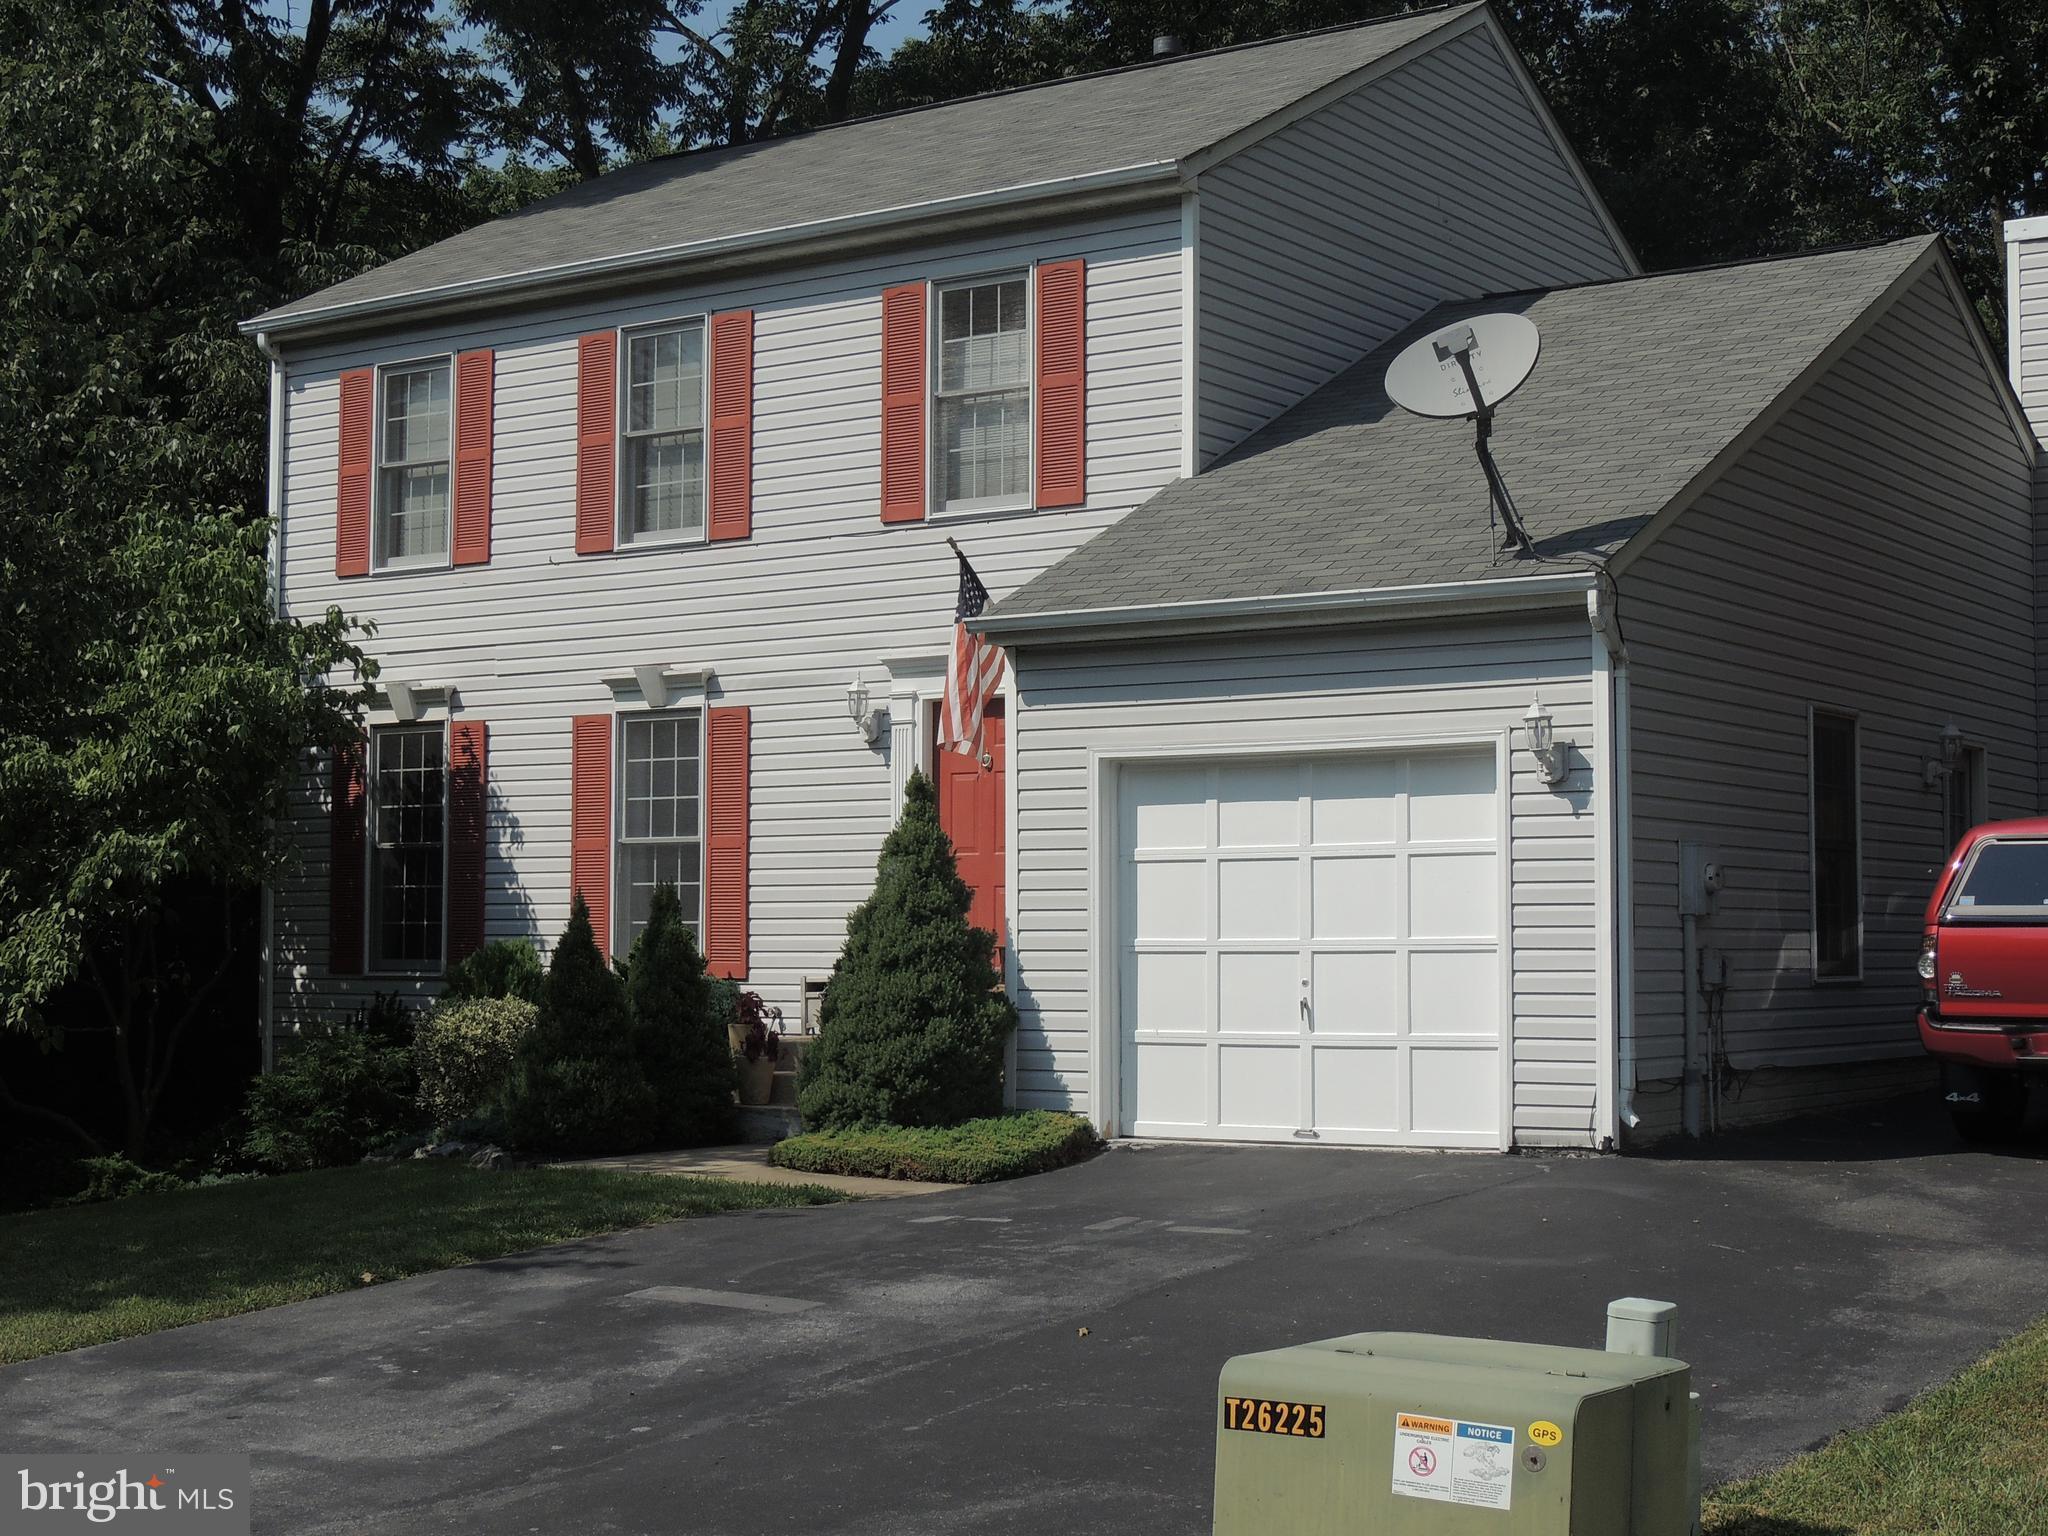 218 PEMBRIDGE Dr, Winchester, VA, 22602